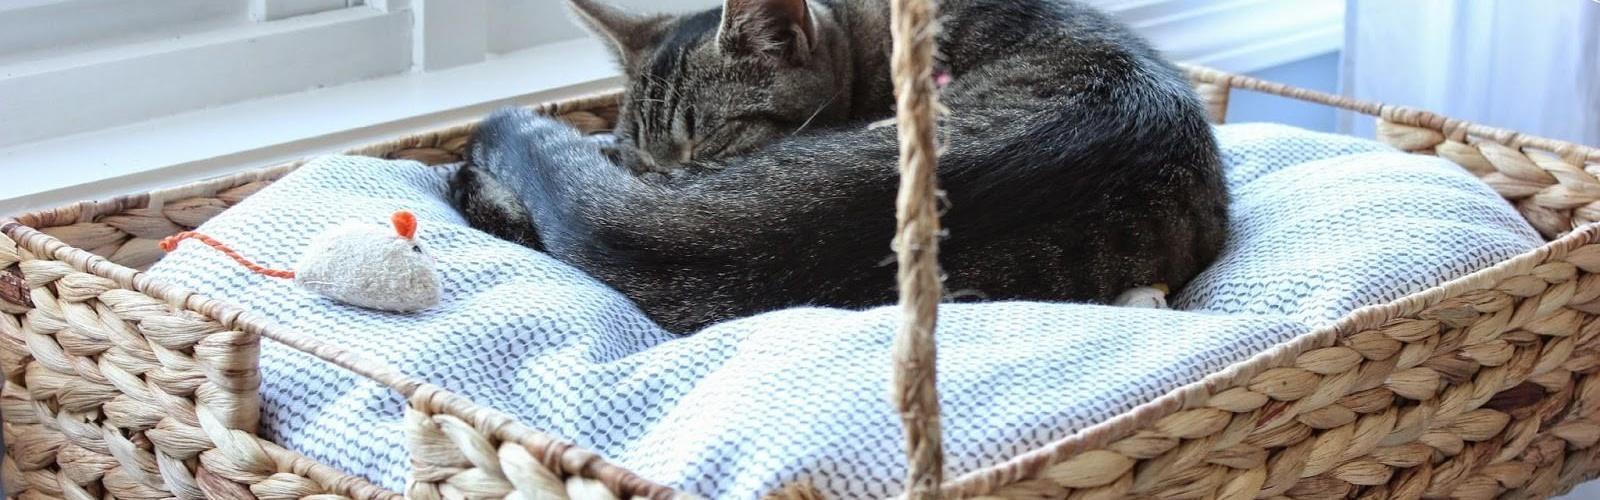 diy-hanging-window-basket-cat-bed